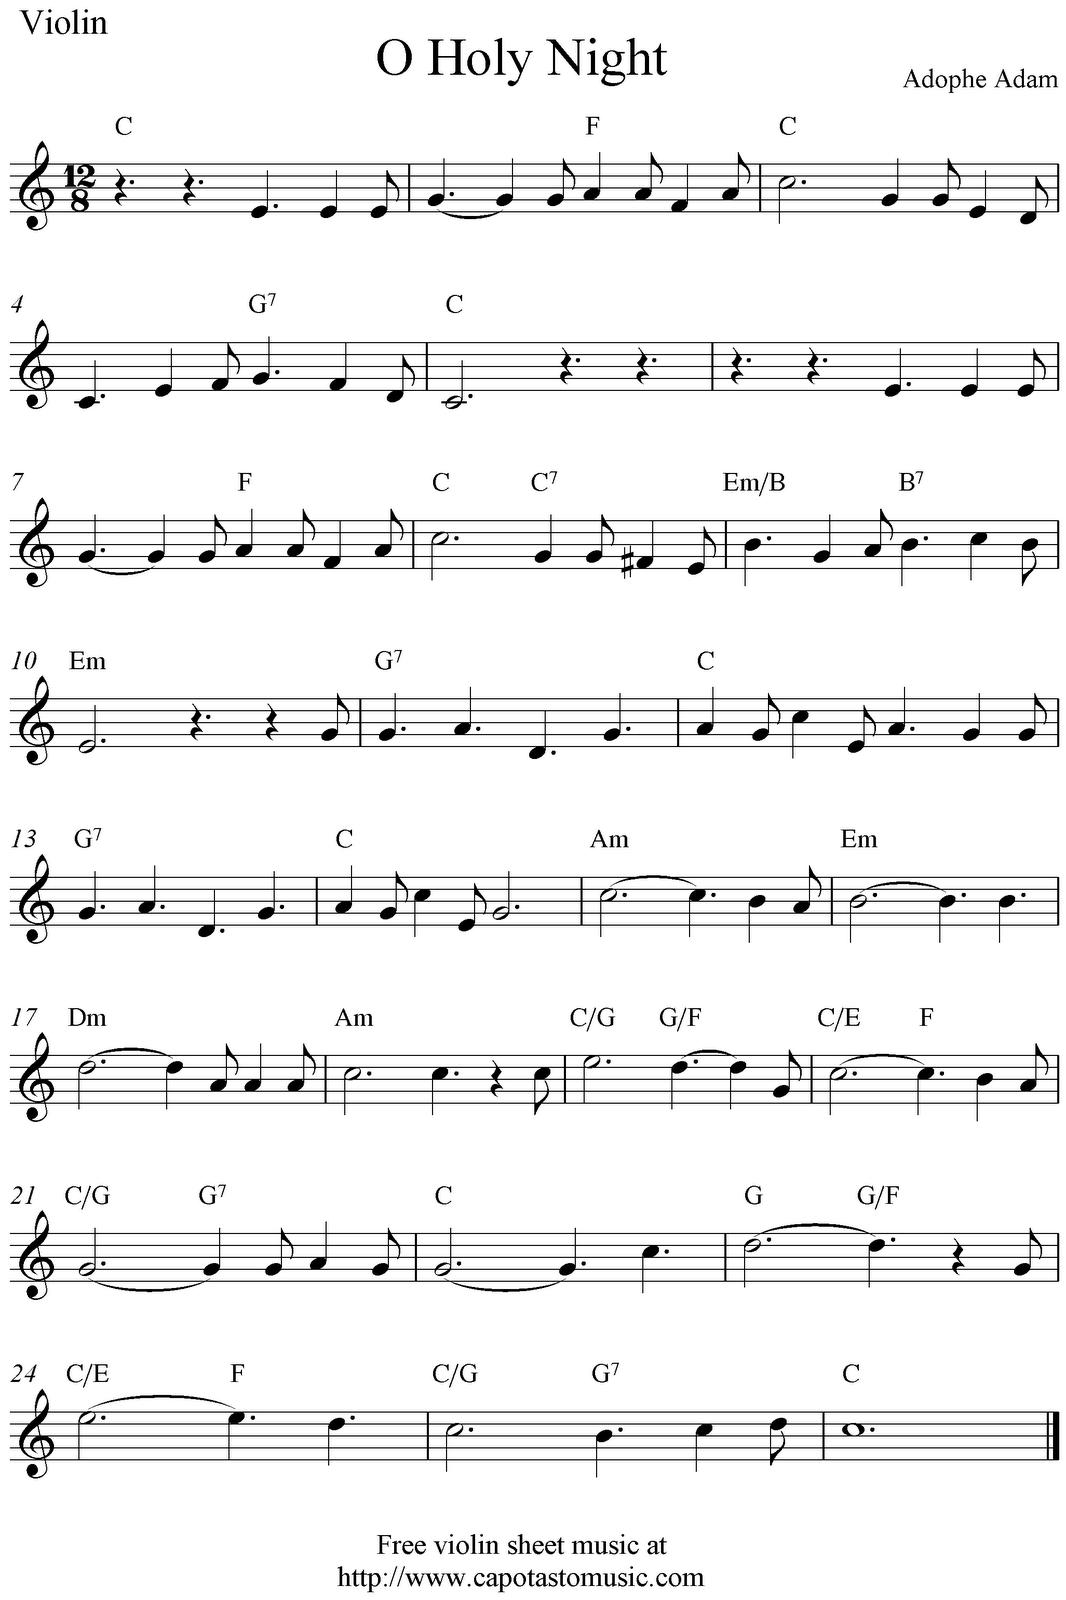 Free Christmas Music.Violin Sheet Music Christmas Music Sheet Music Scores O